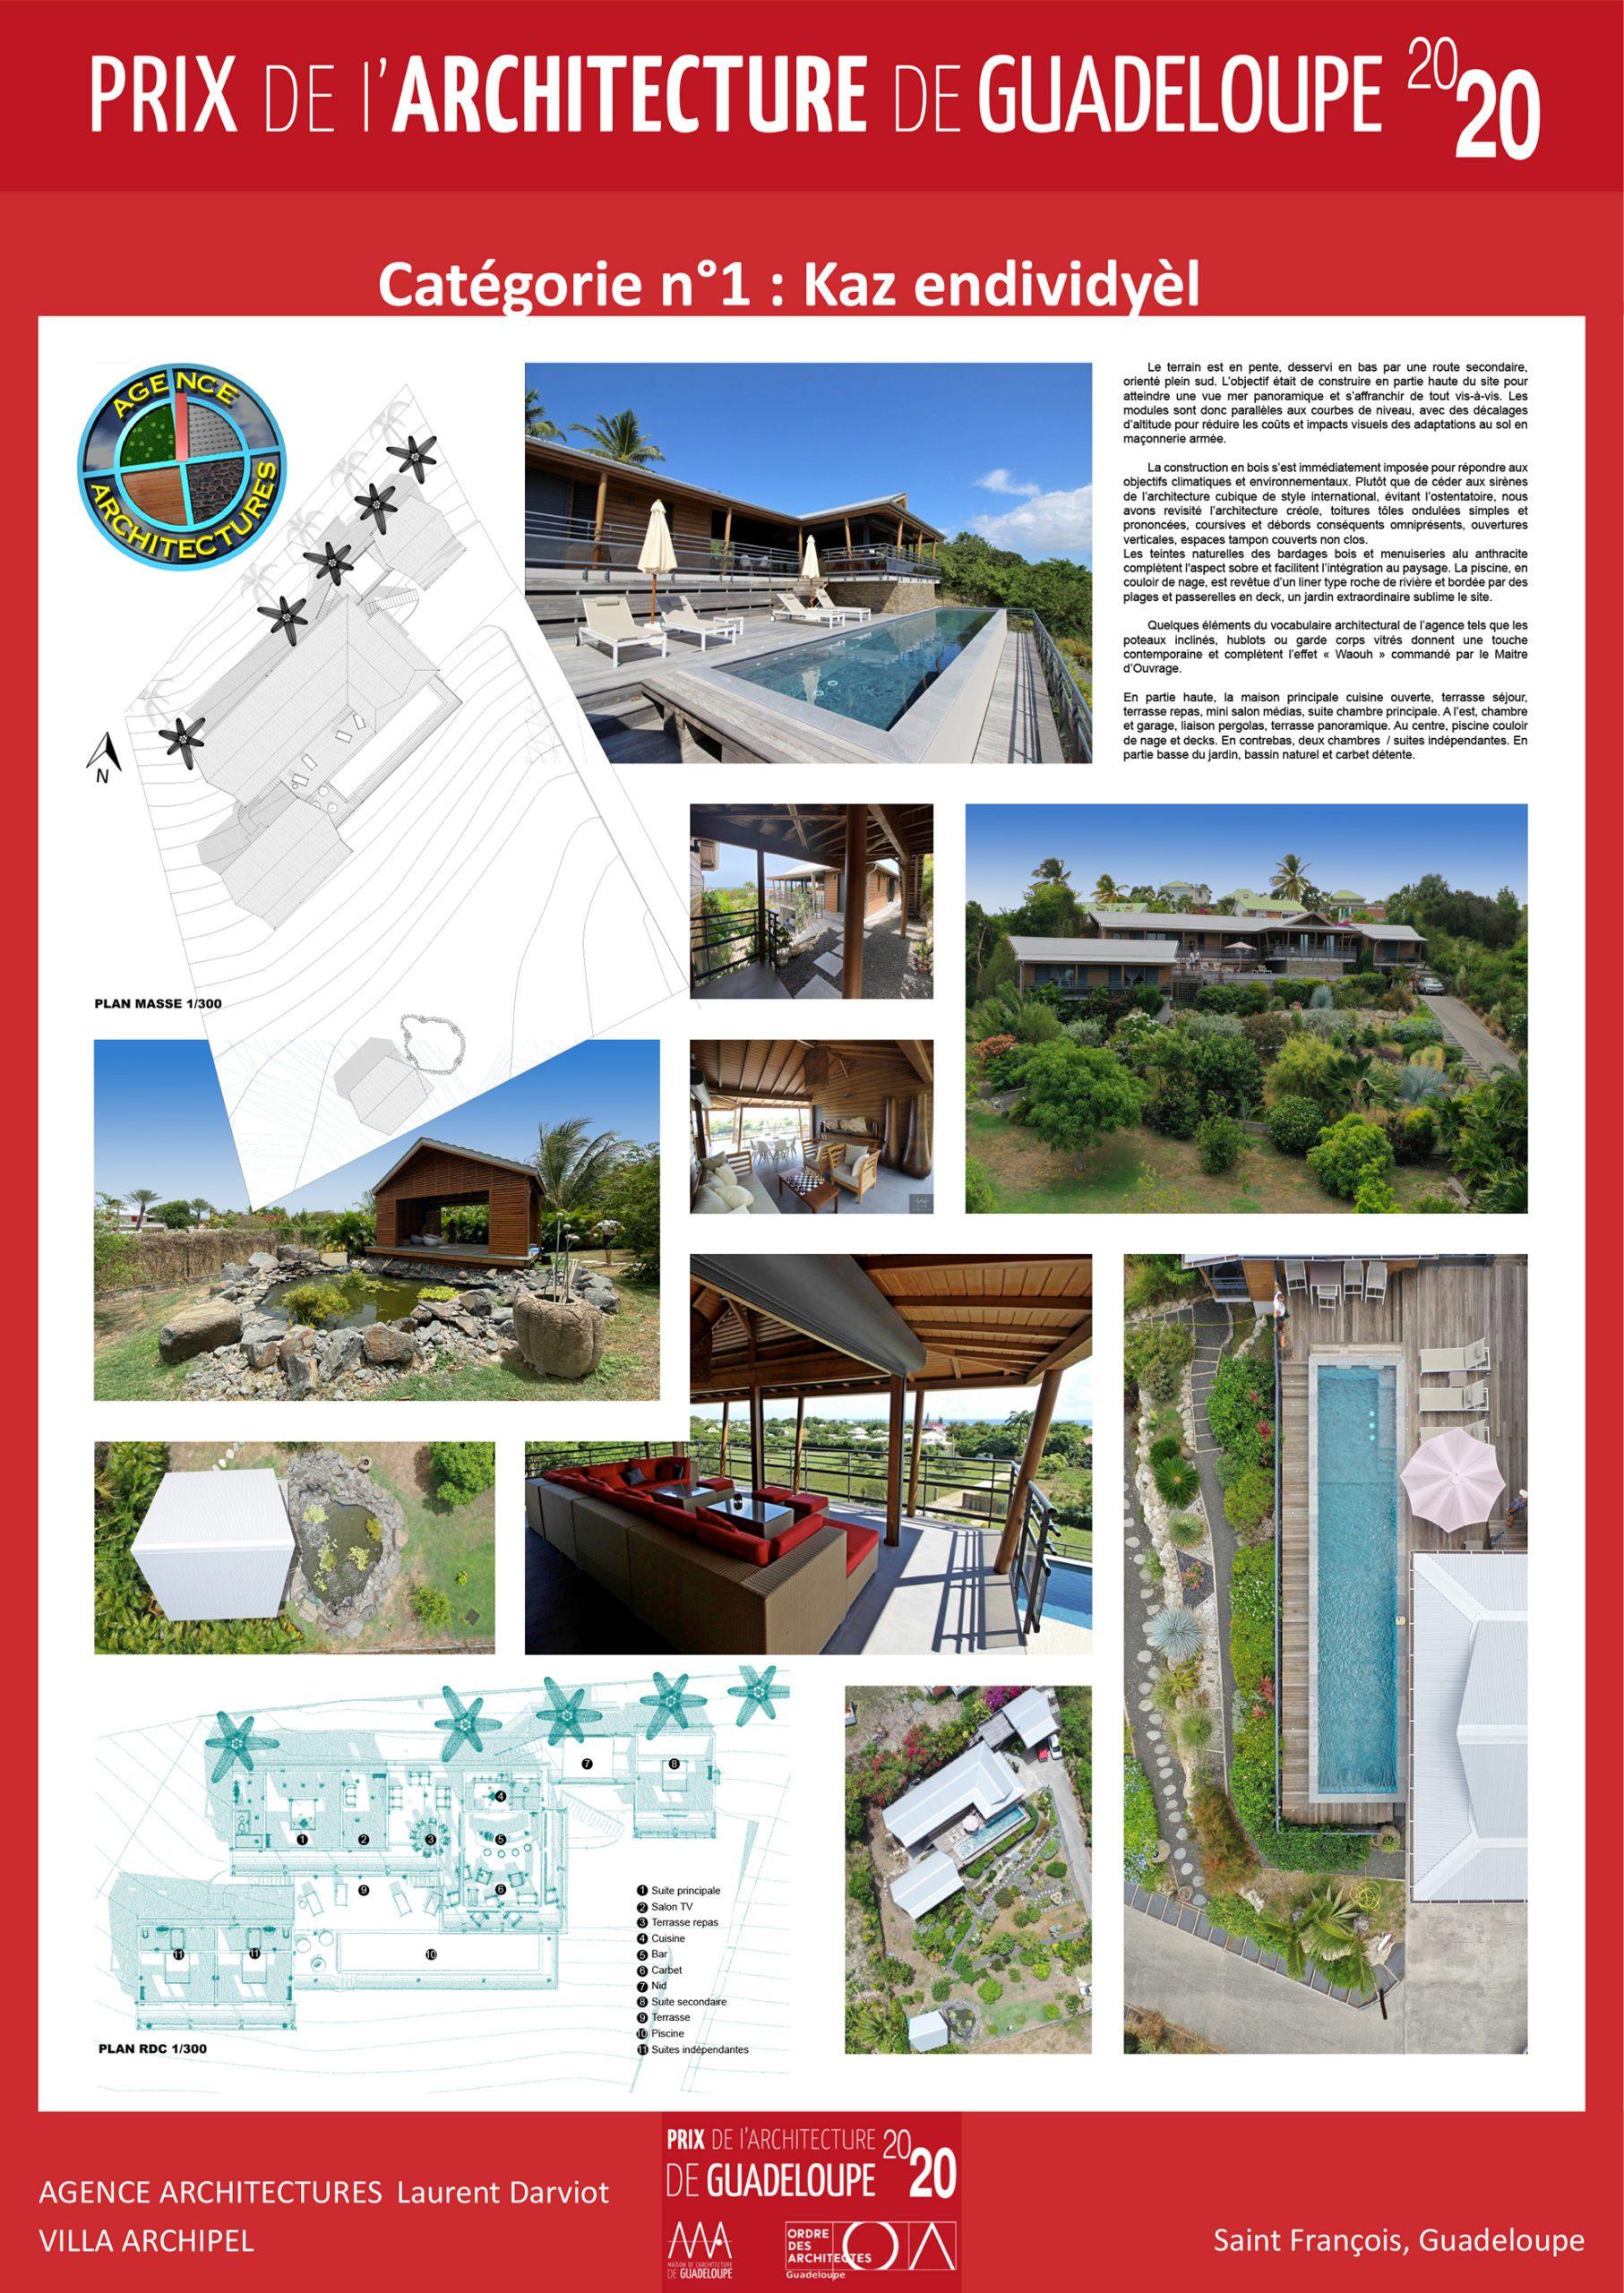 Villa Archipel (Laurent Darviot)